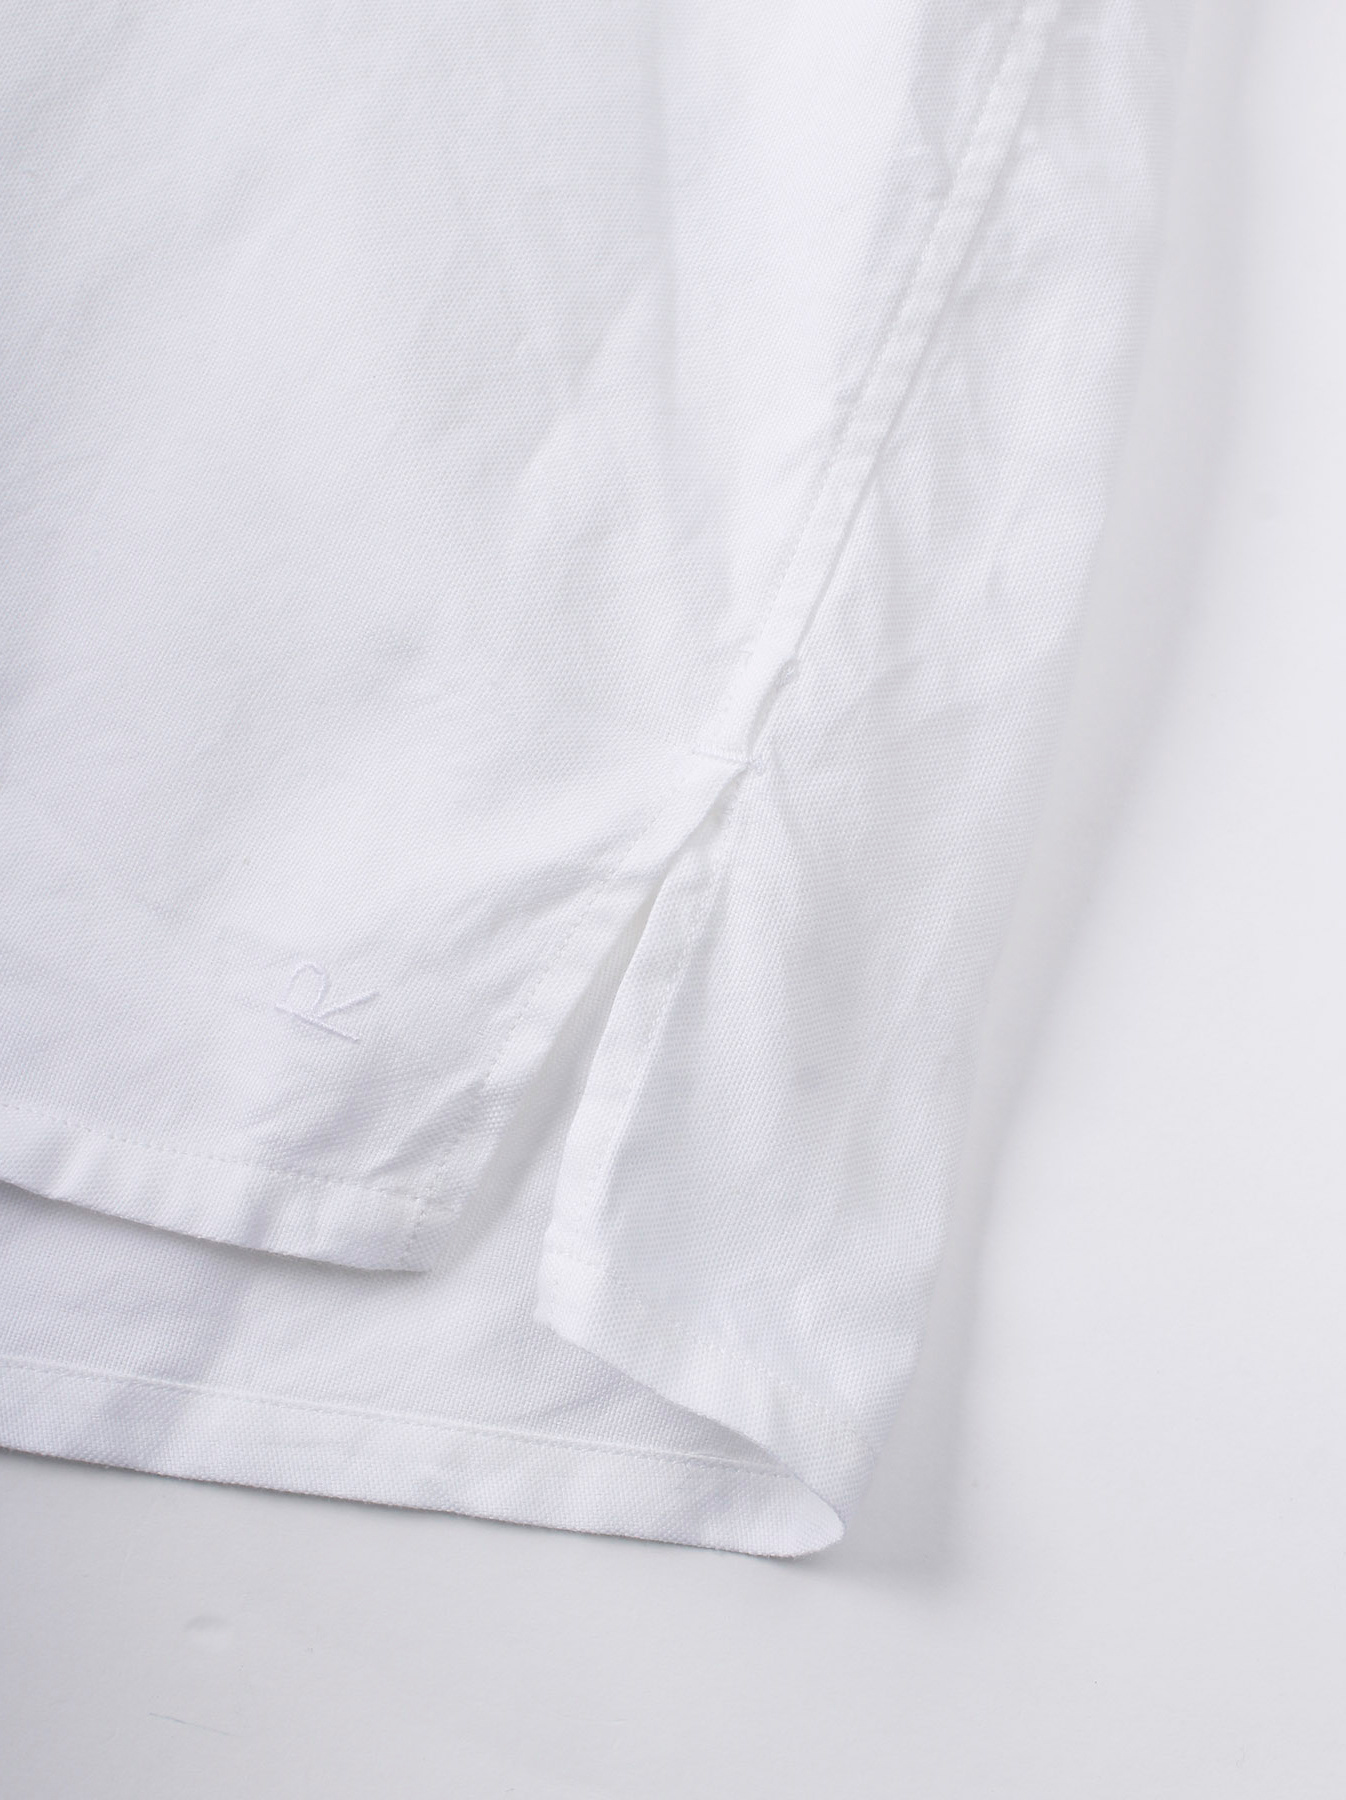 Oxford Stand Collar Shirt-11